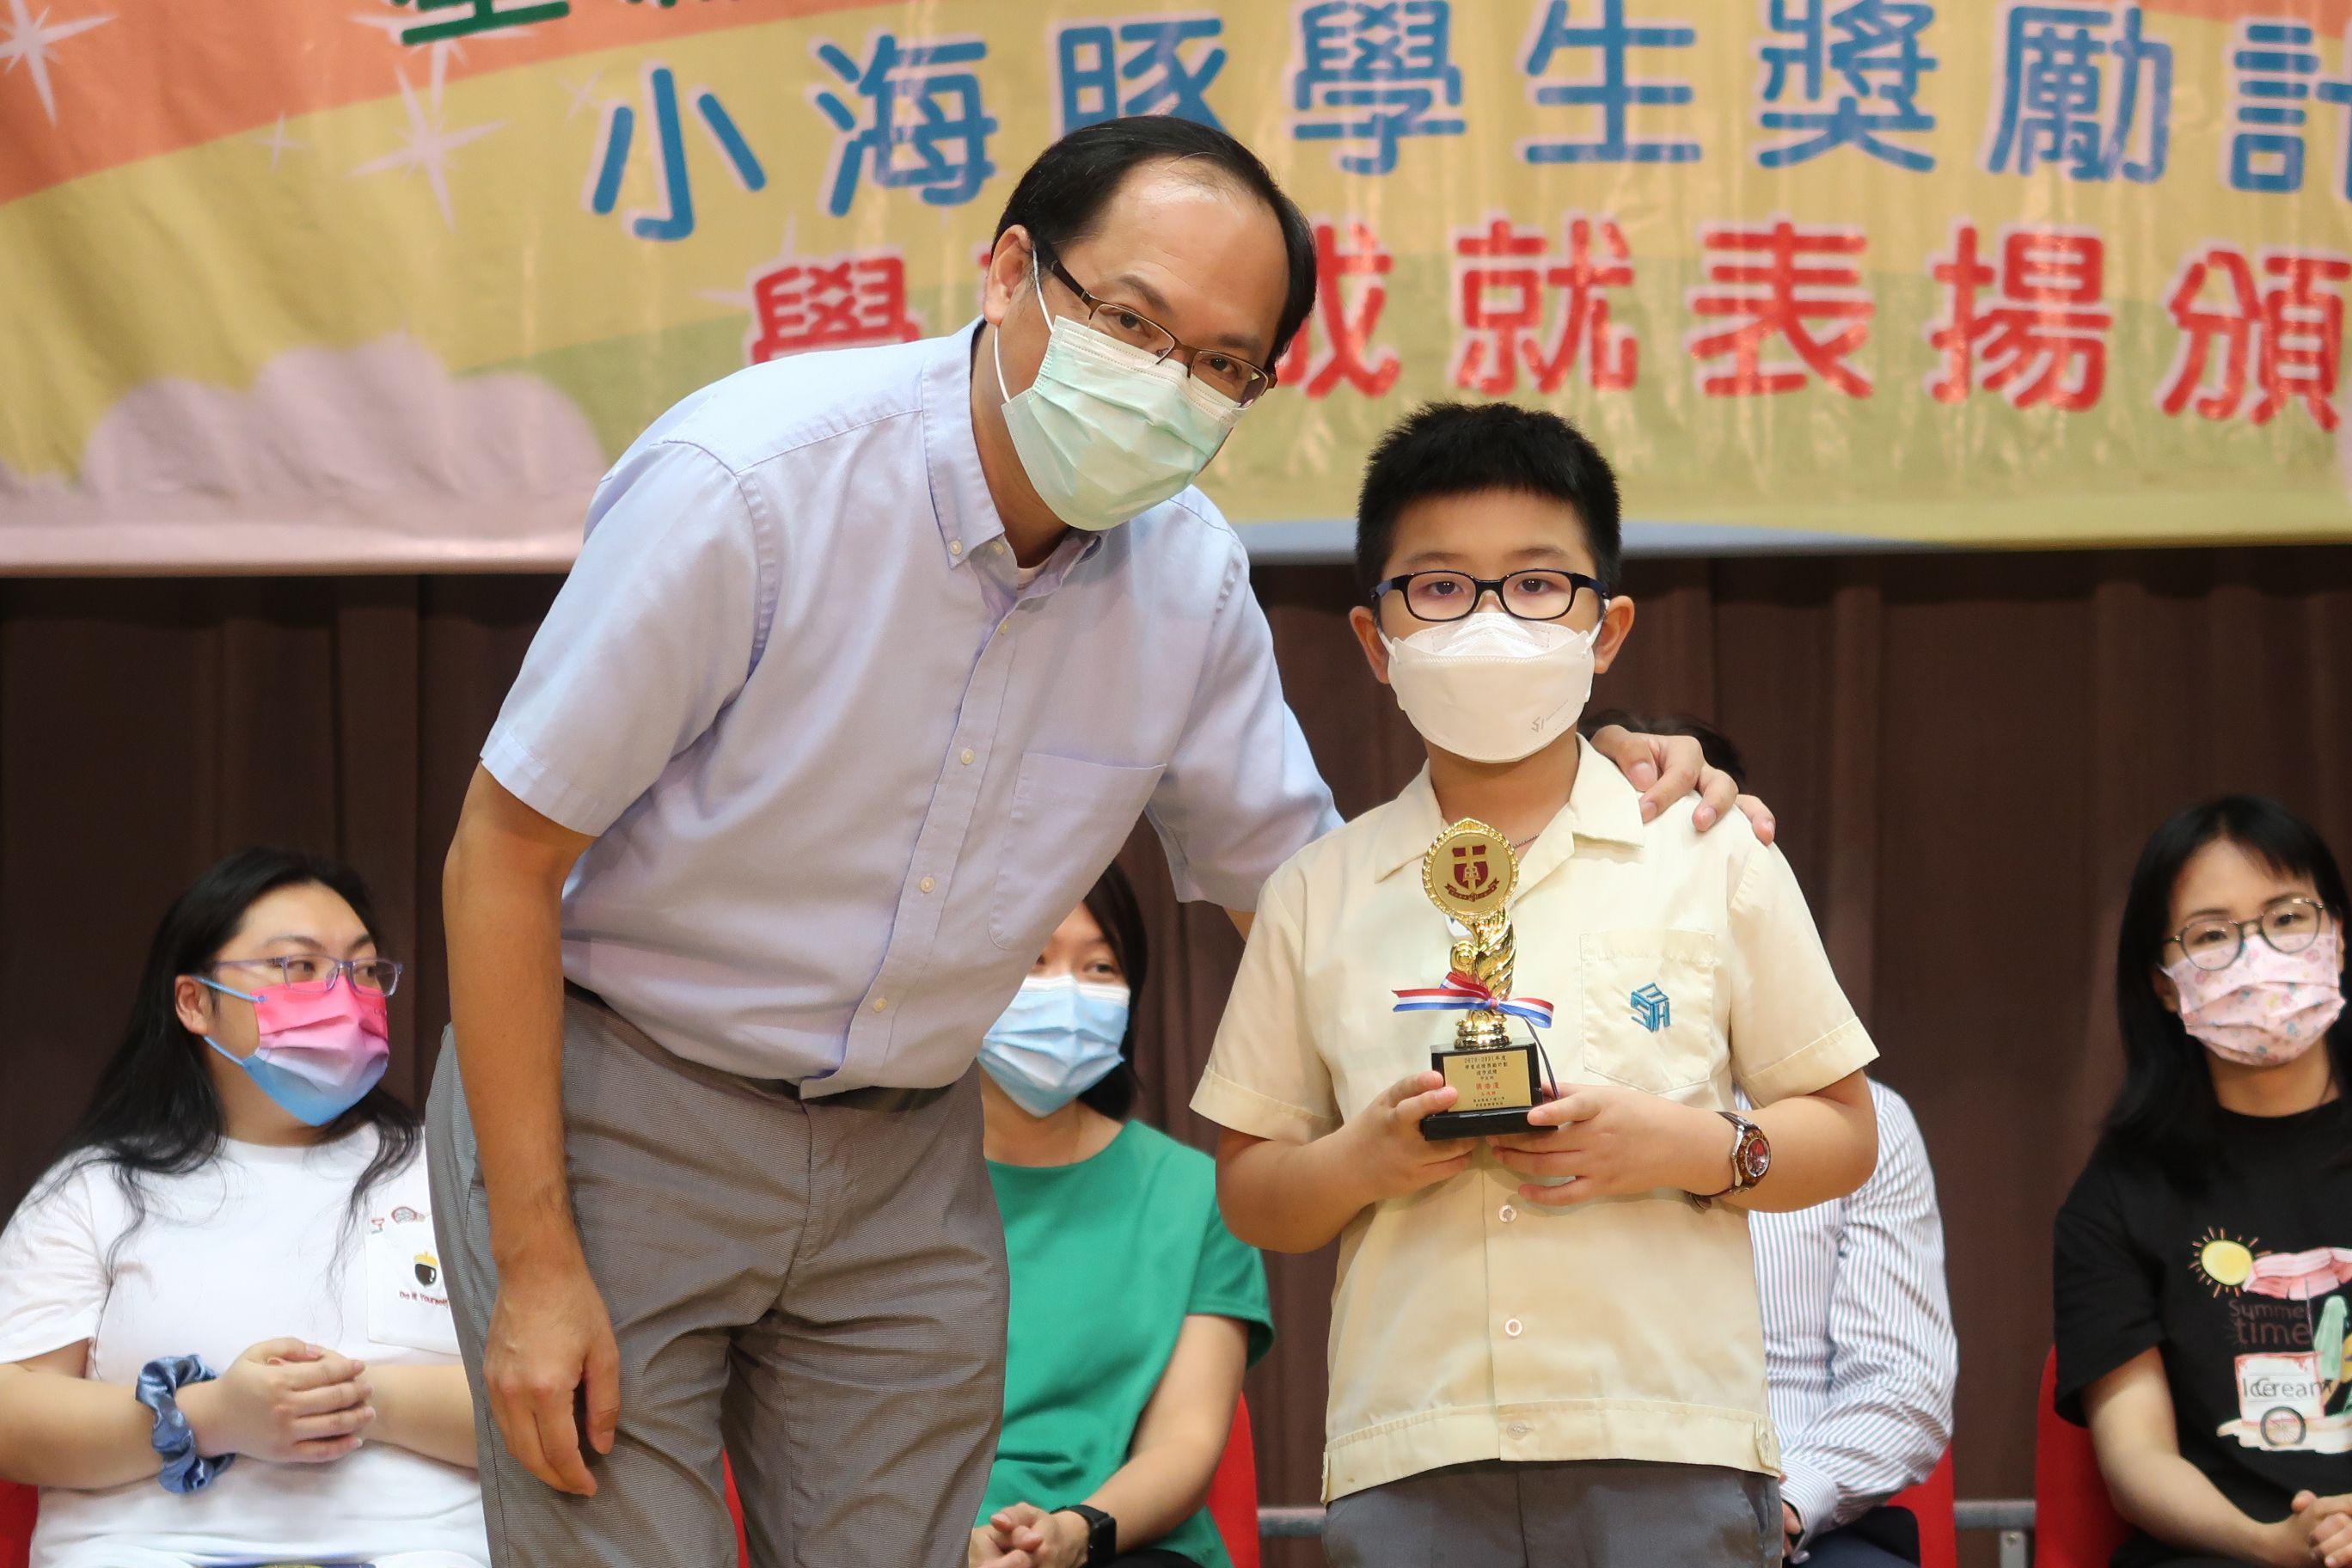 https://syh.edu.hk/sites/default/files/img_5682.jpg